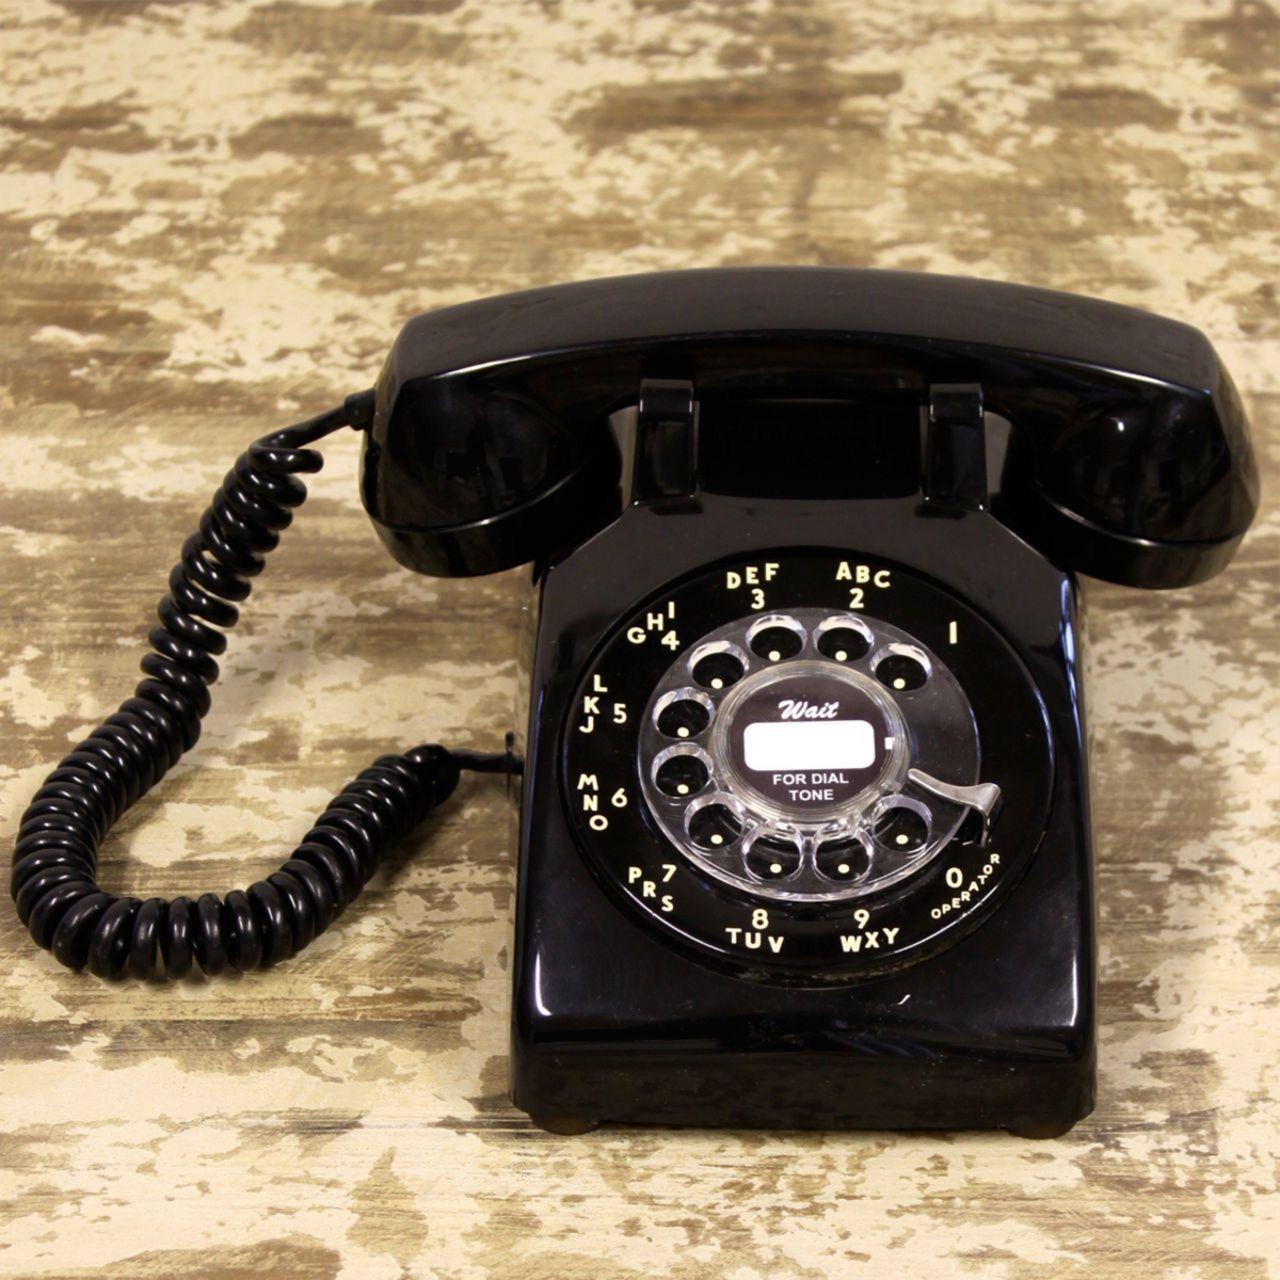 A telephone made of polyoxybenzylmethylenglycolanhydride